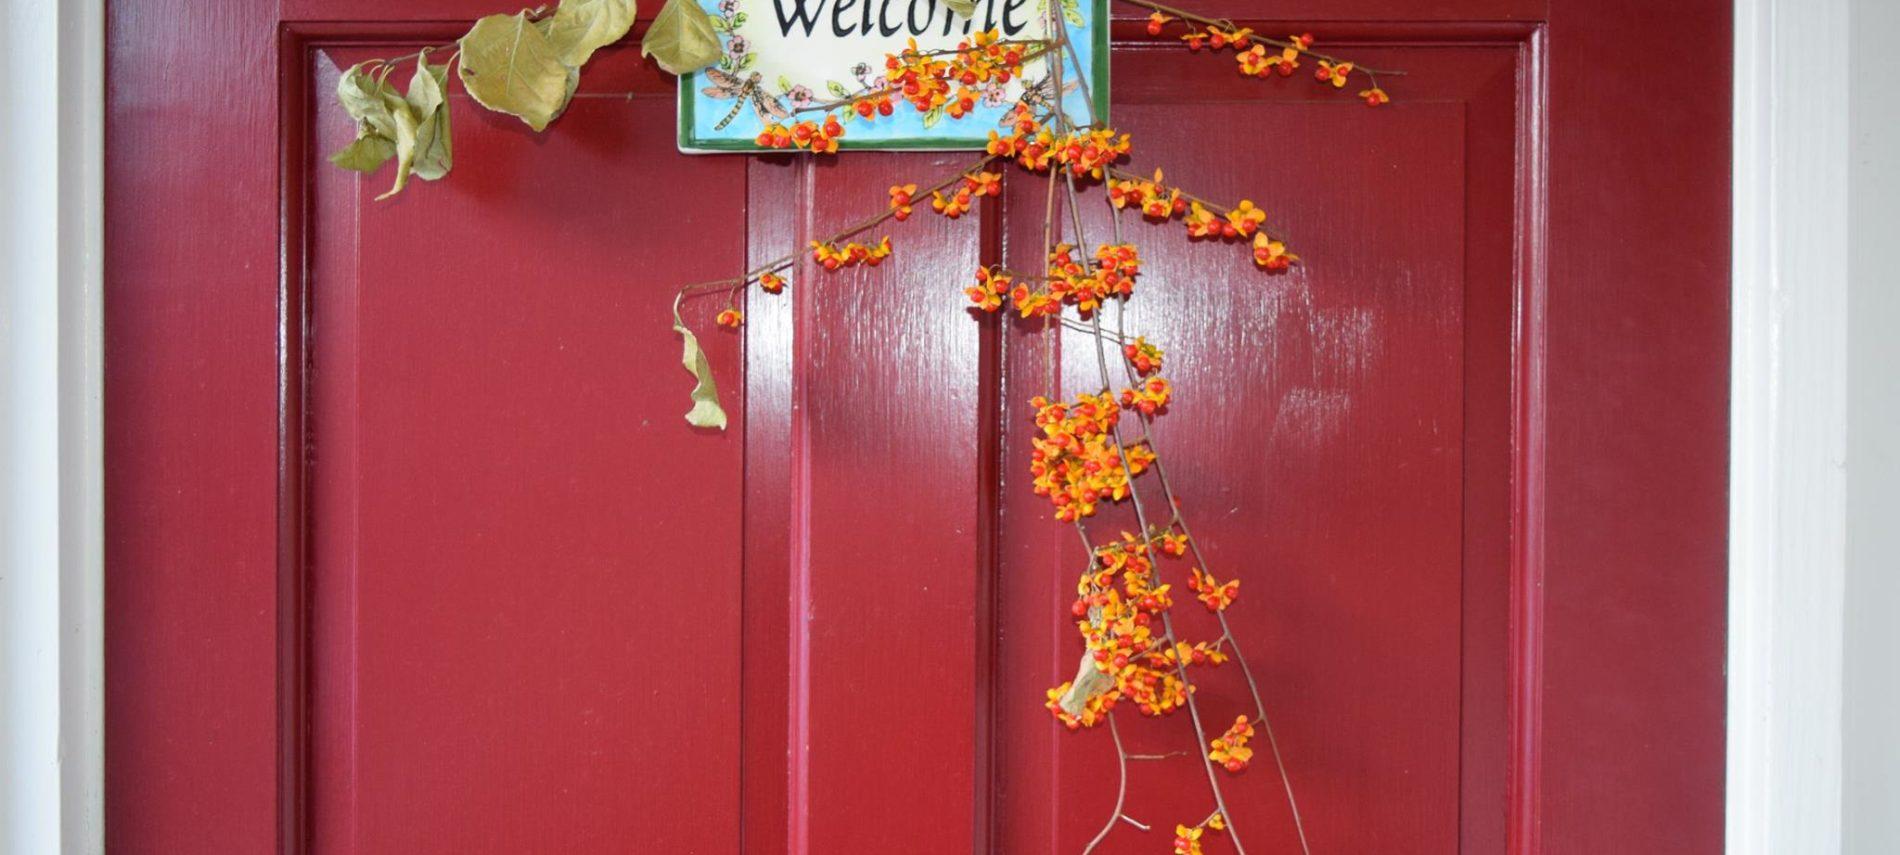 Deerfield Inn wreath